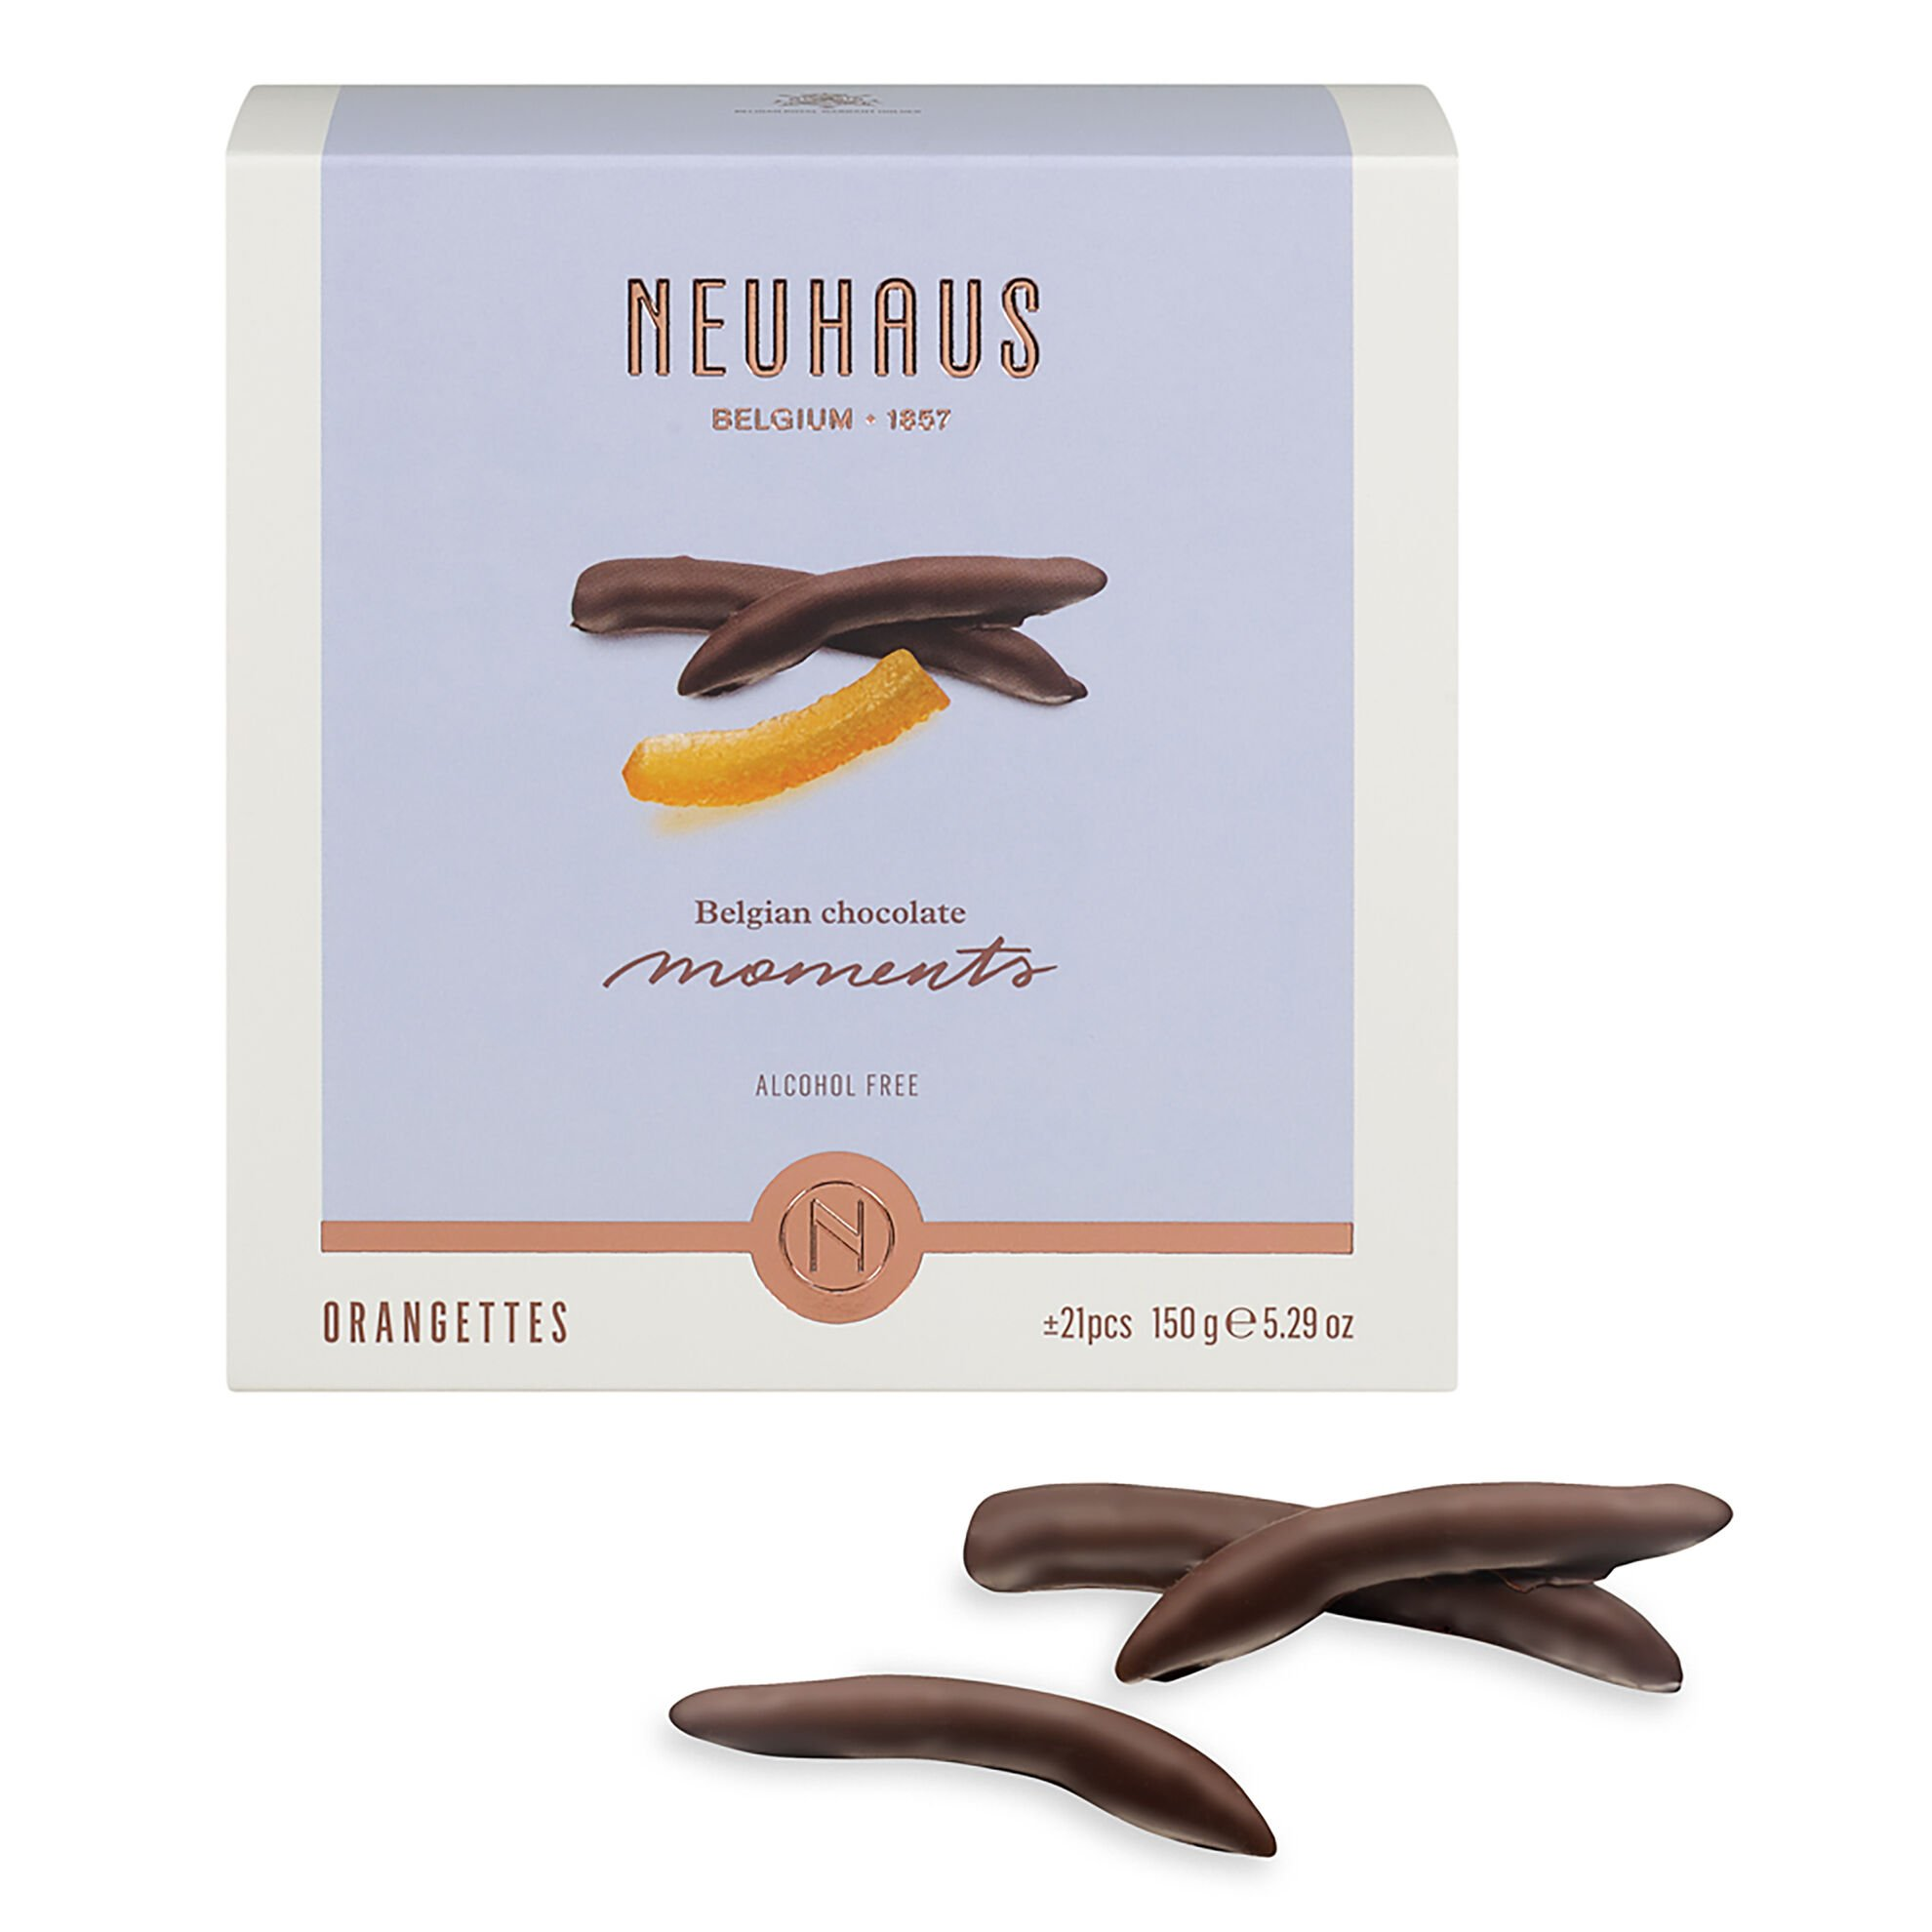 Belgian Chocolate Moments - Orangettes image number 11